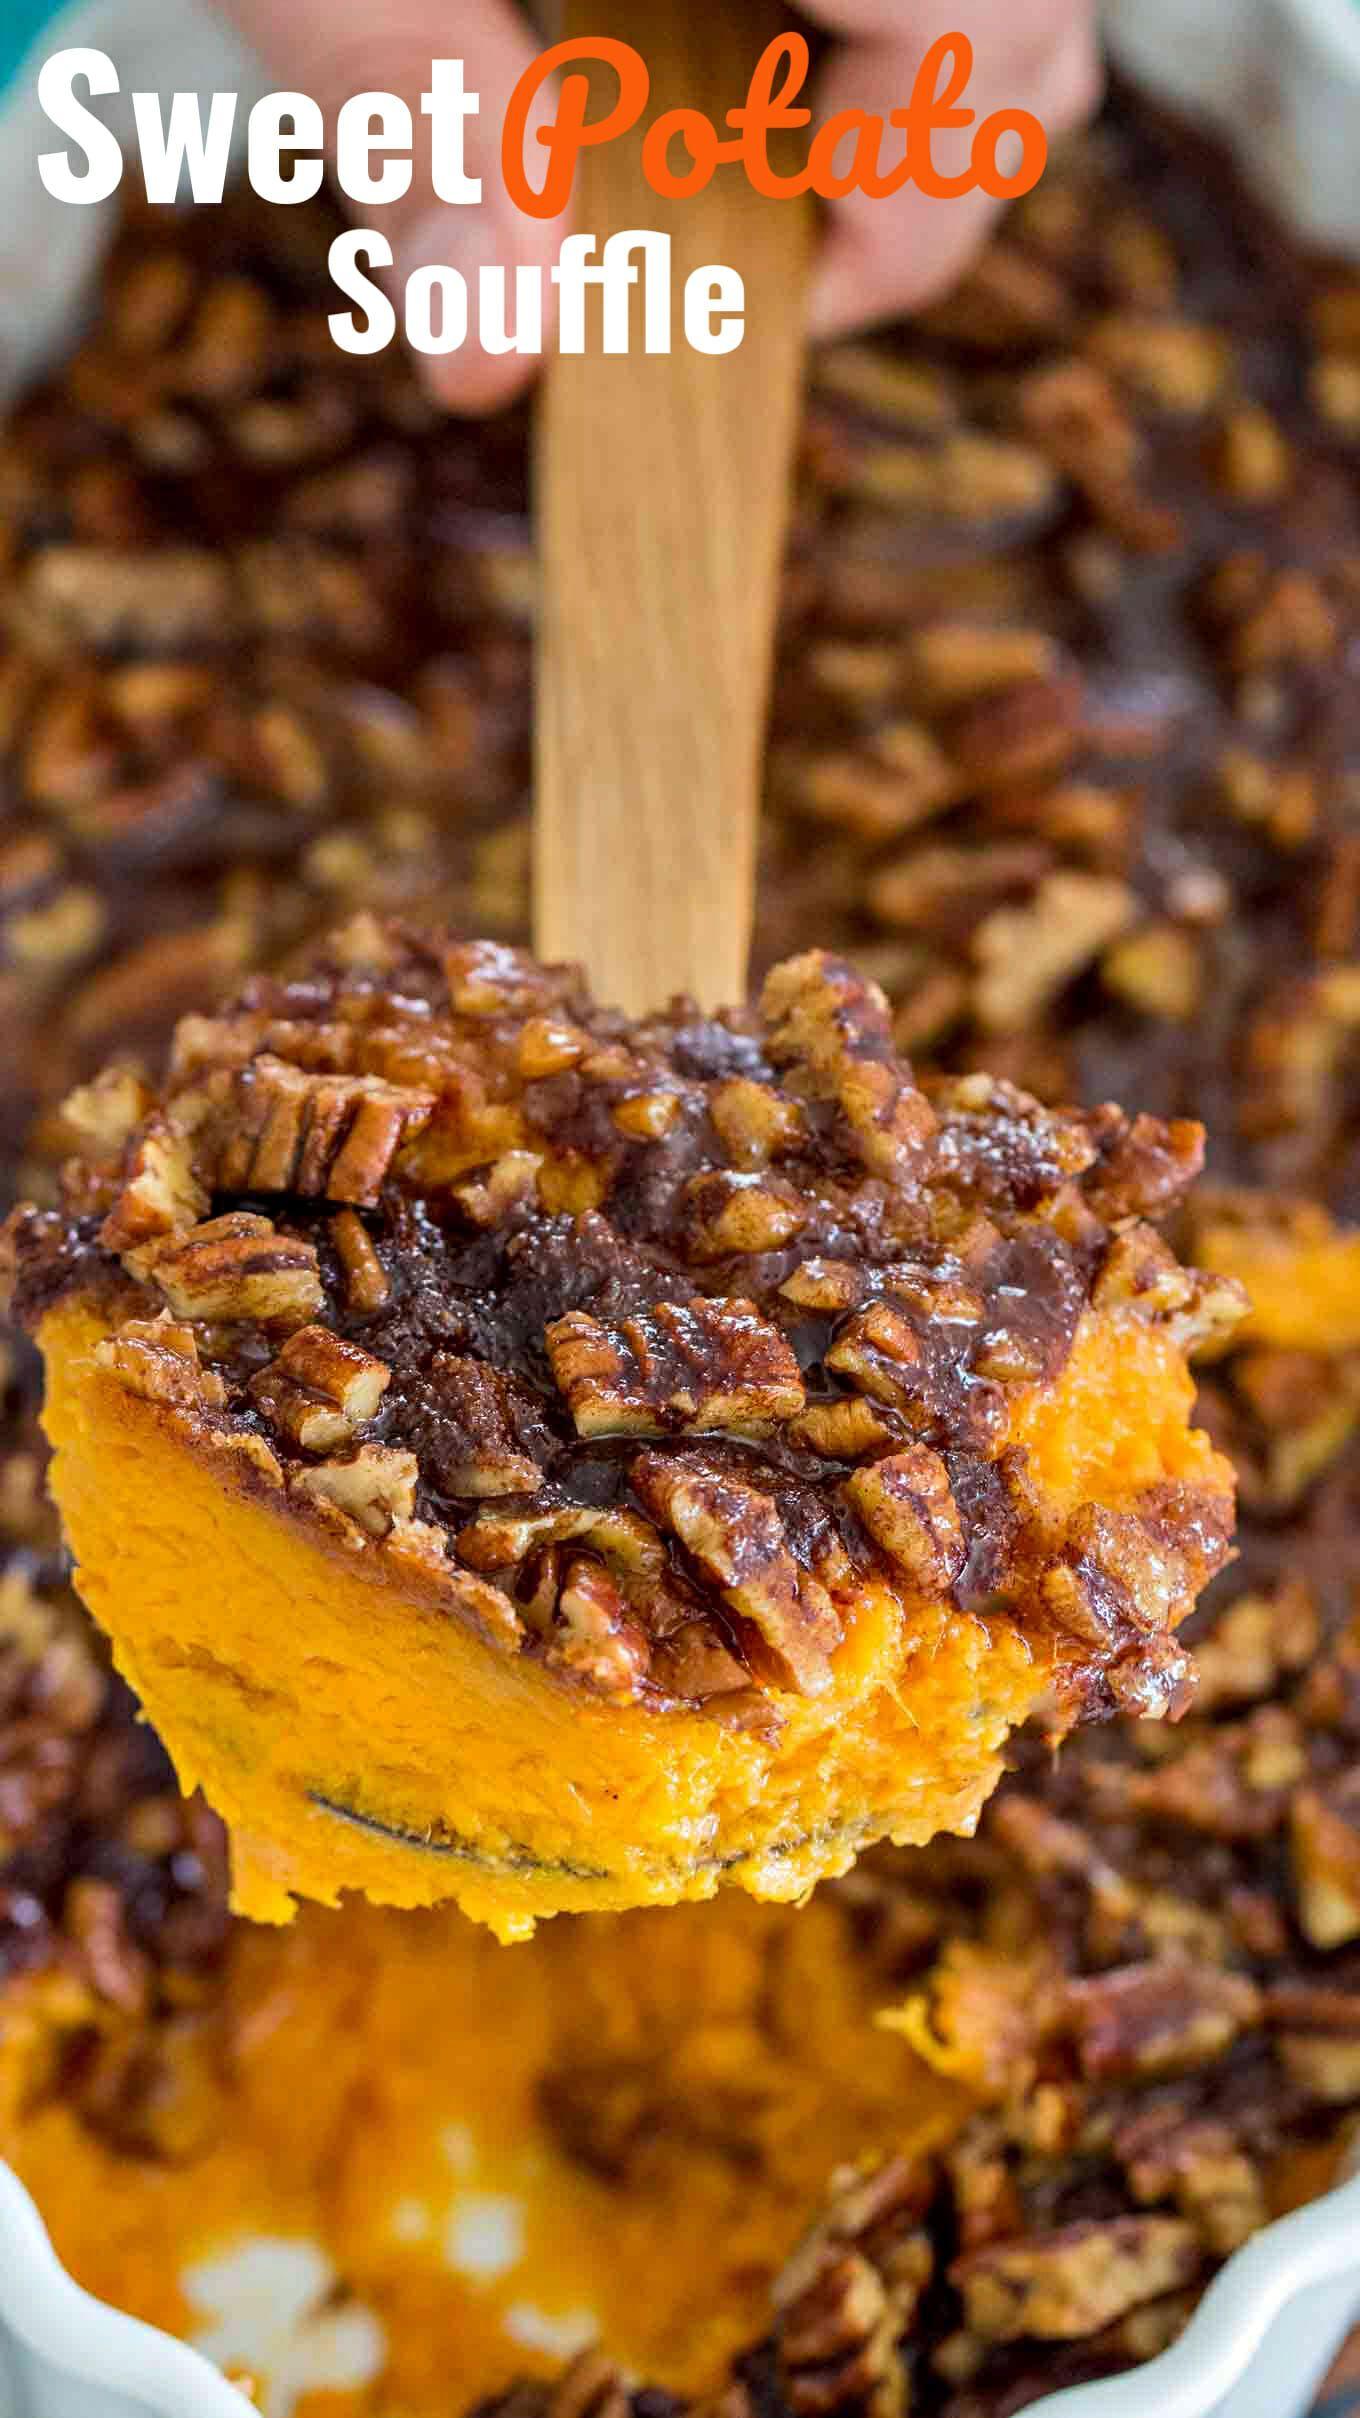 Sweet Potato Souffle Recipe Video